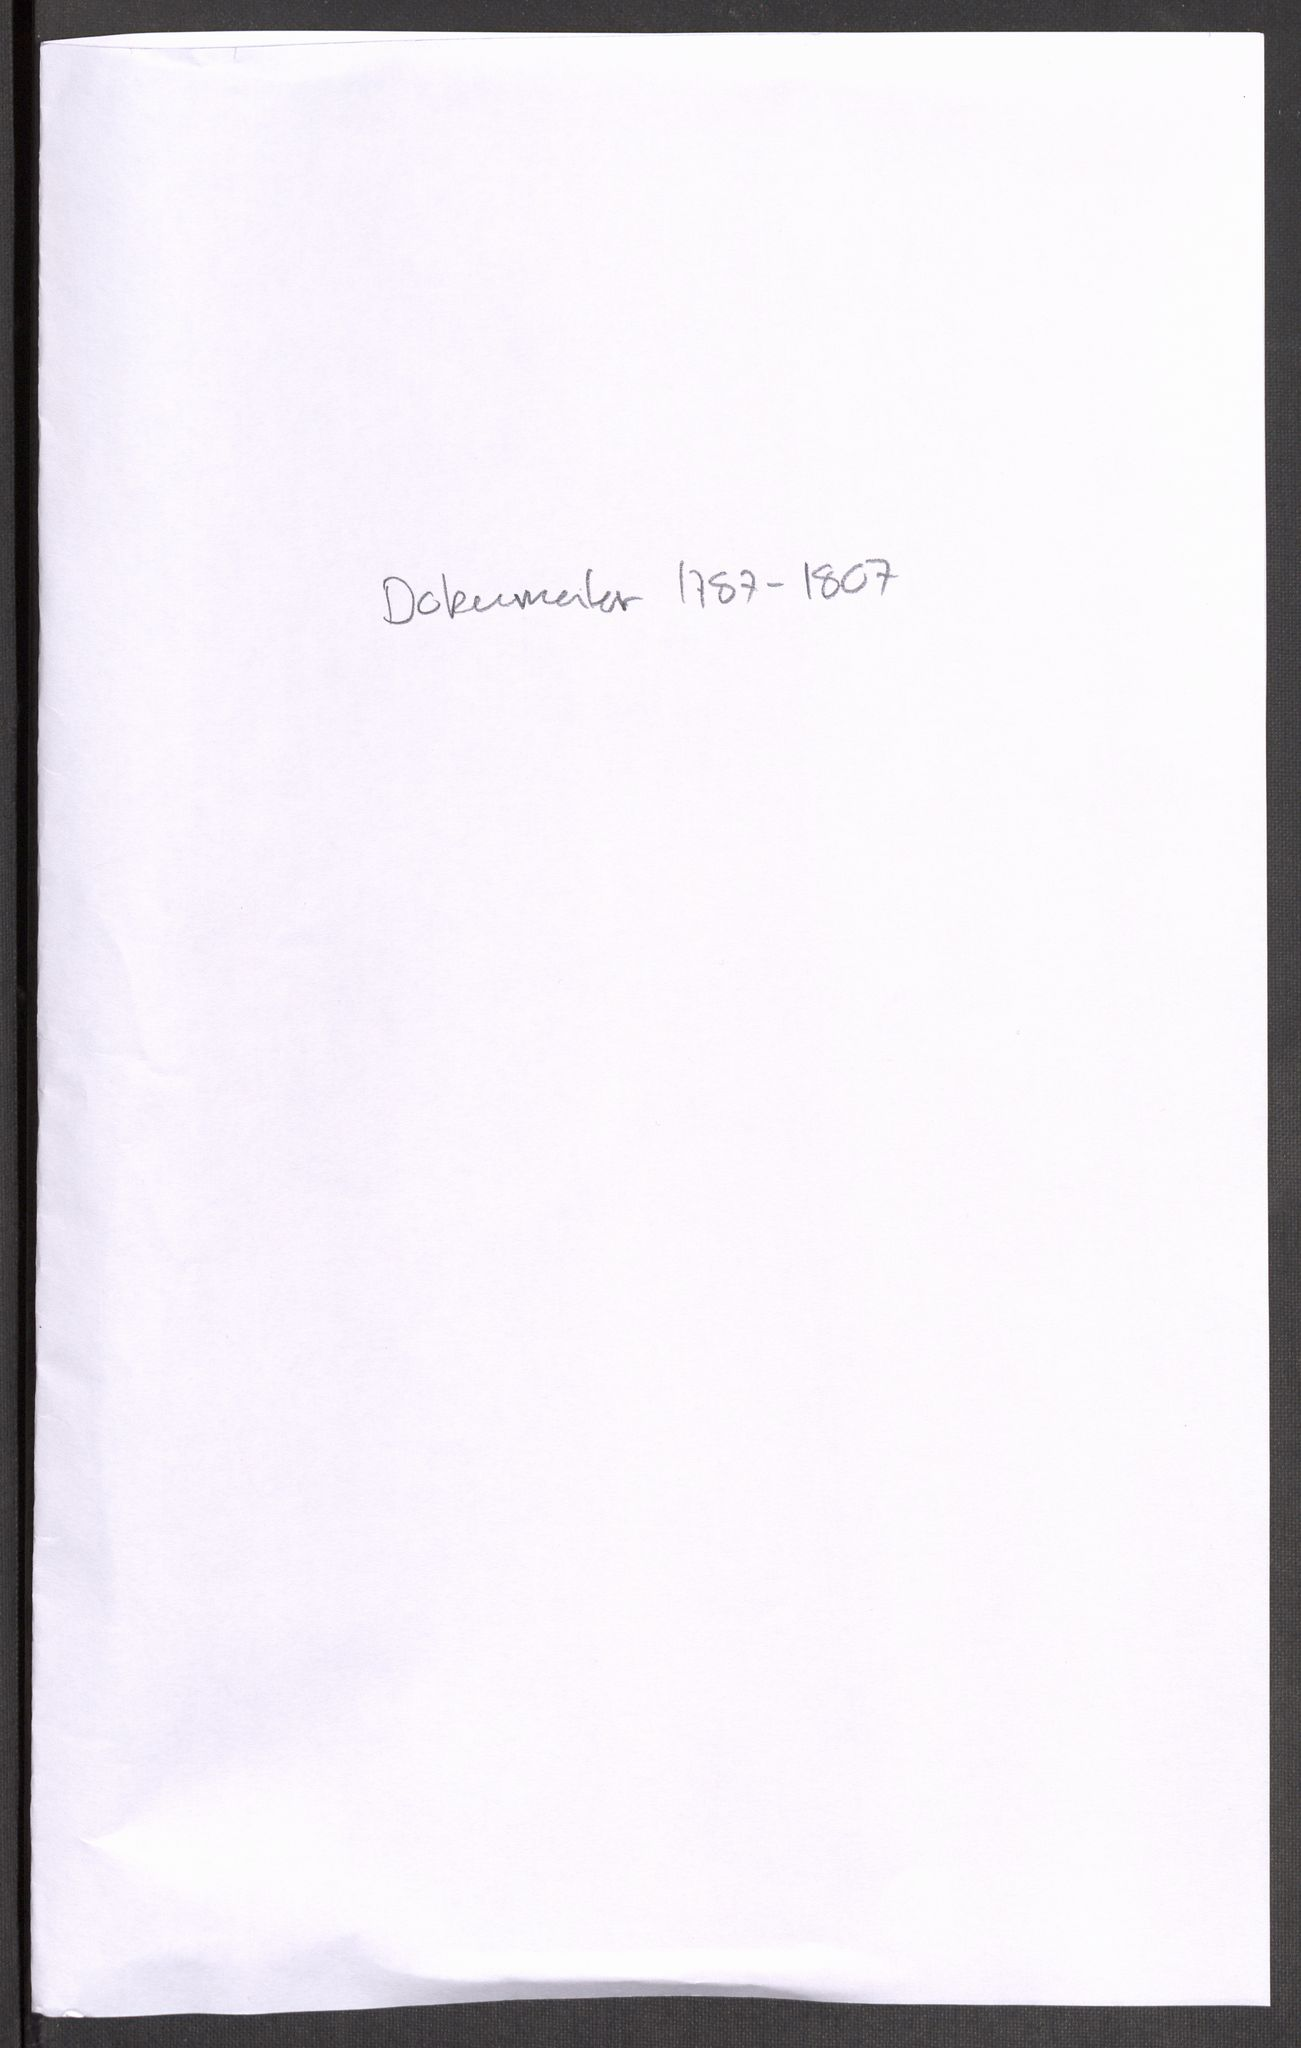 RA, Kommersekollegiet, Brannforsikringskontoret 1767-1814, F/Fb/L0065: Fredrikstad og Smålenenes amt, 1787-1807